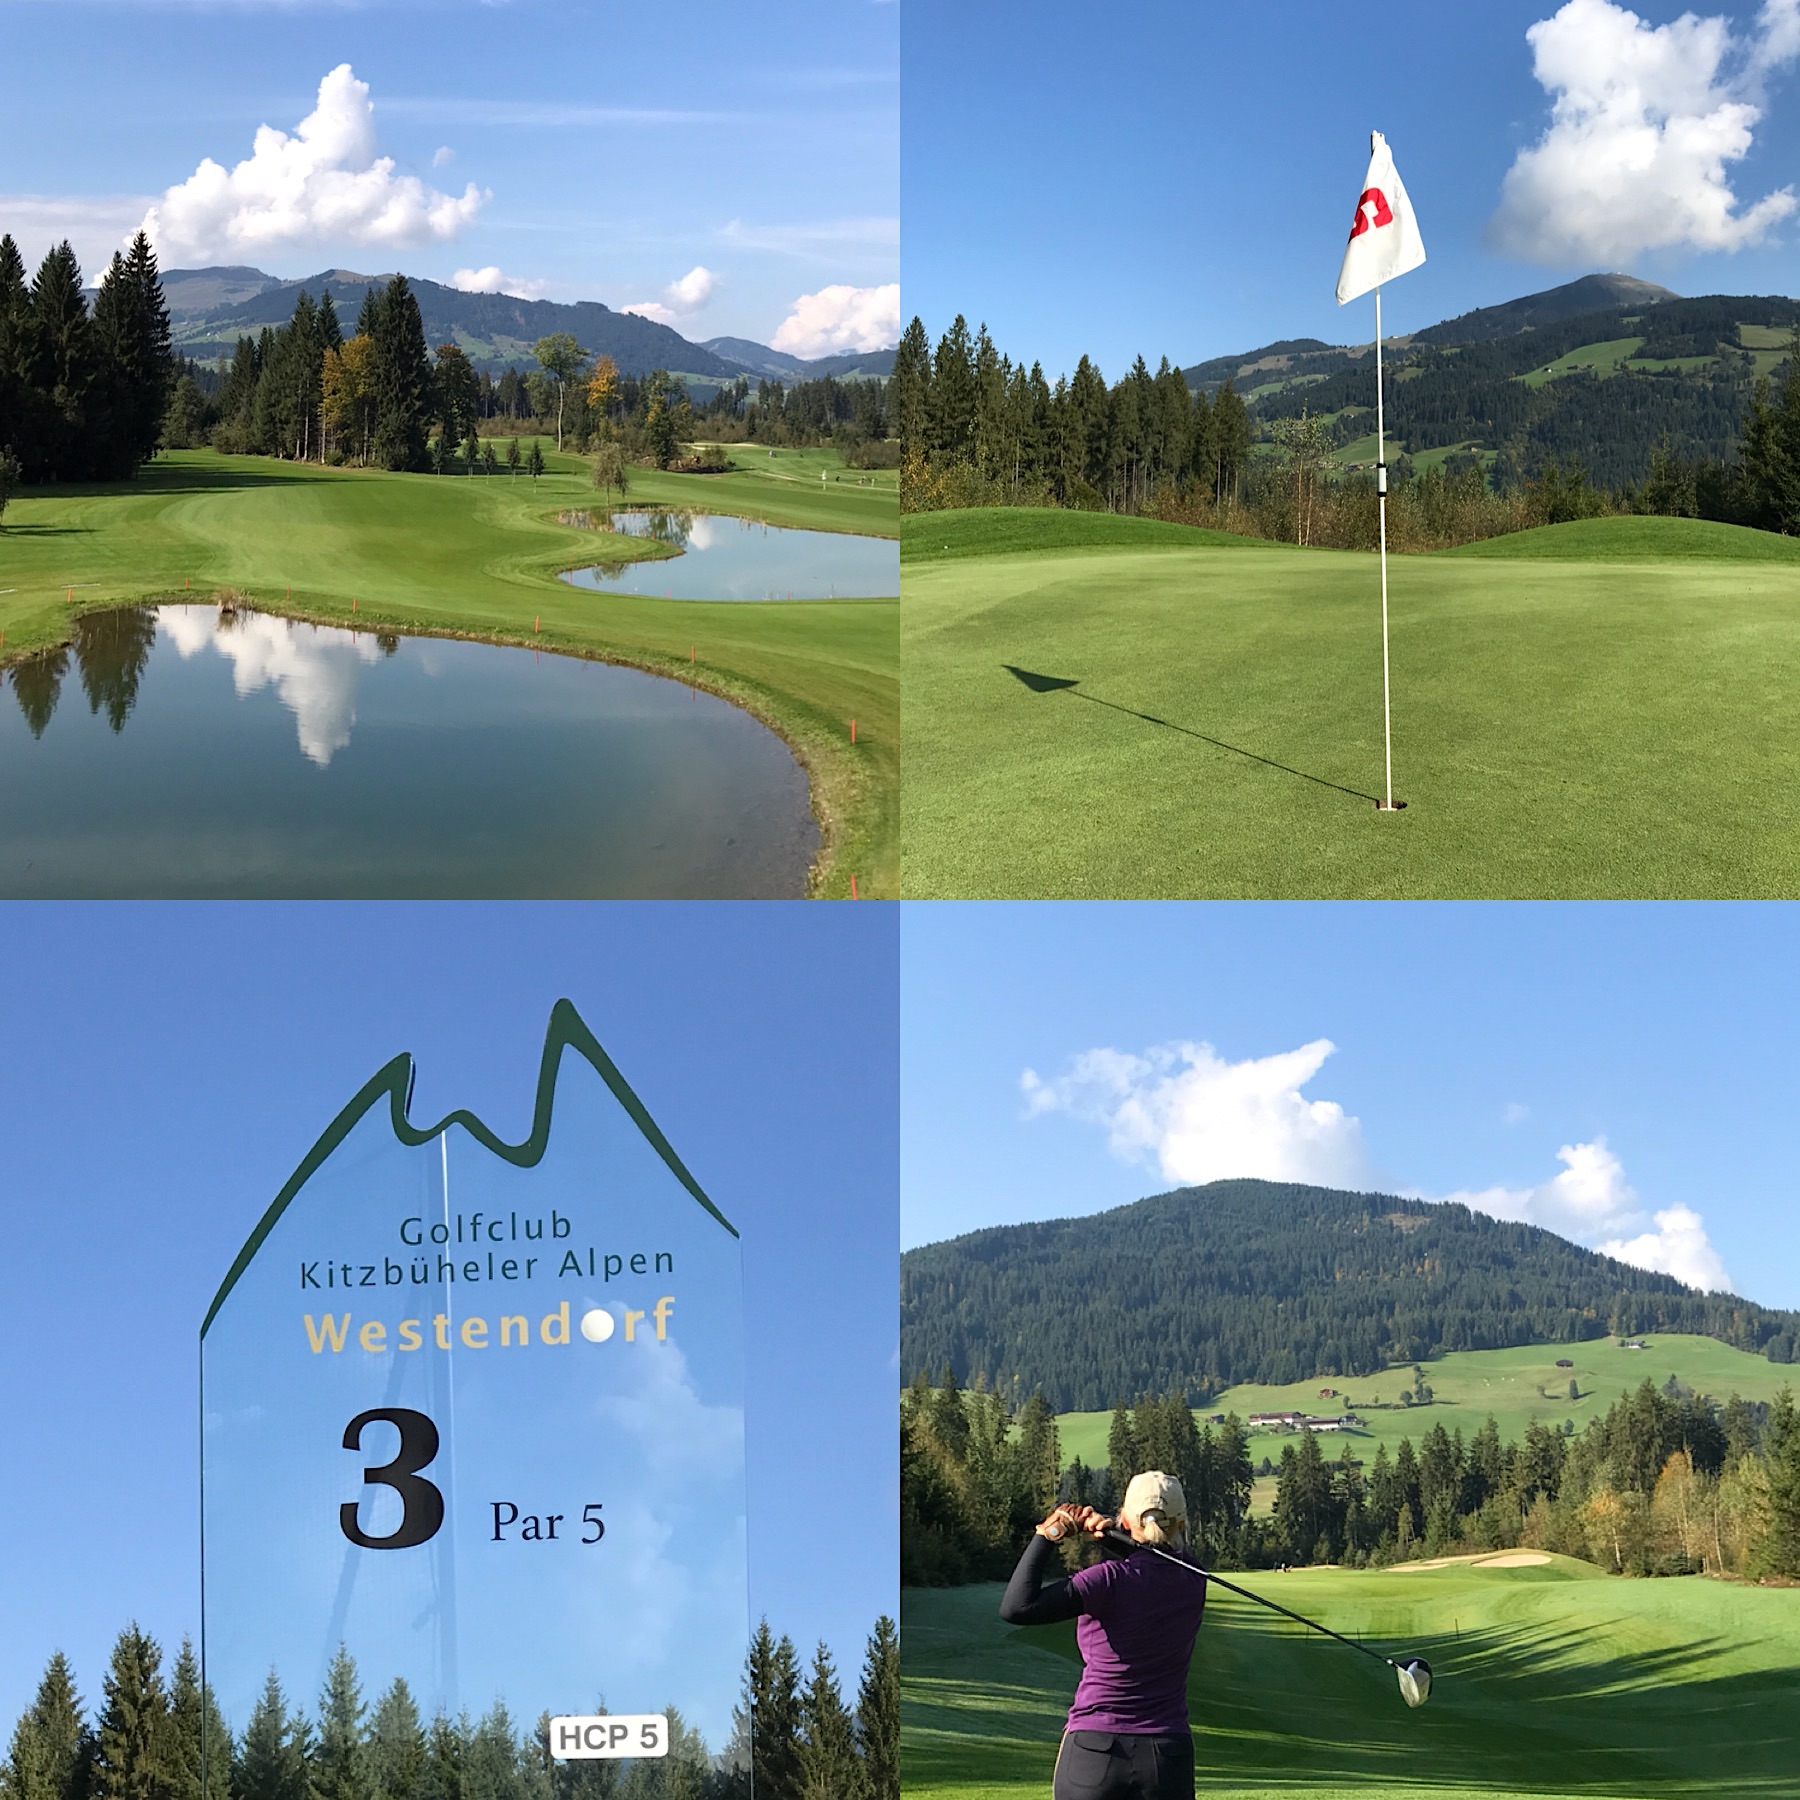 Kitzbuheler Alpen golf course westendorf